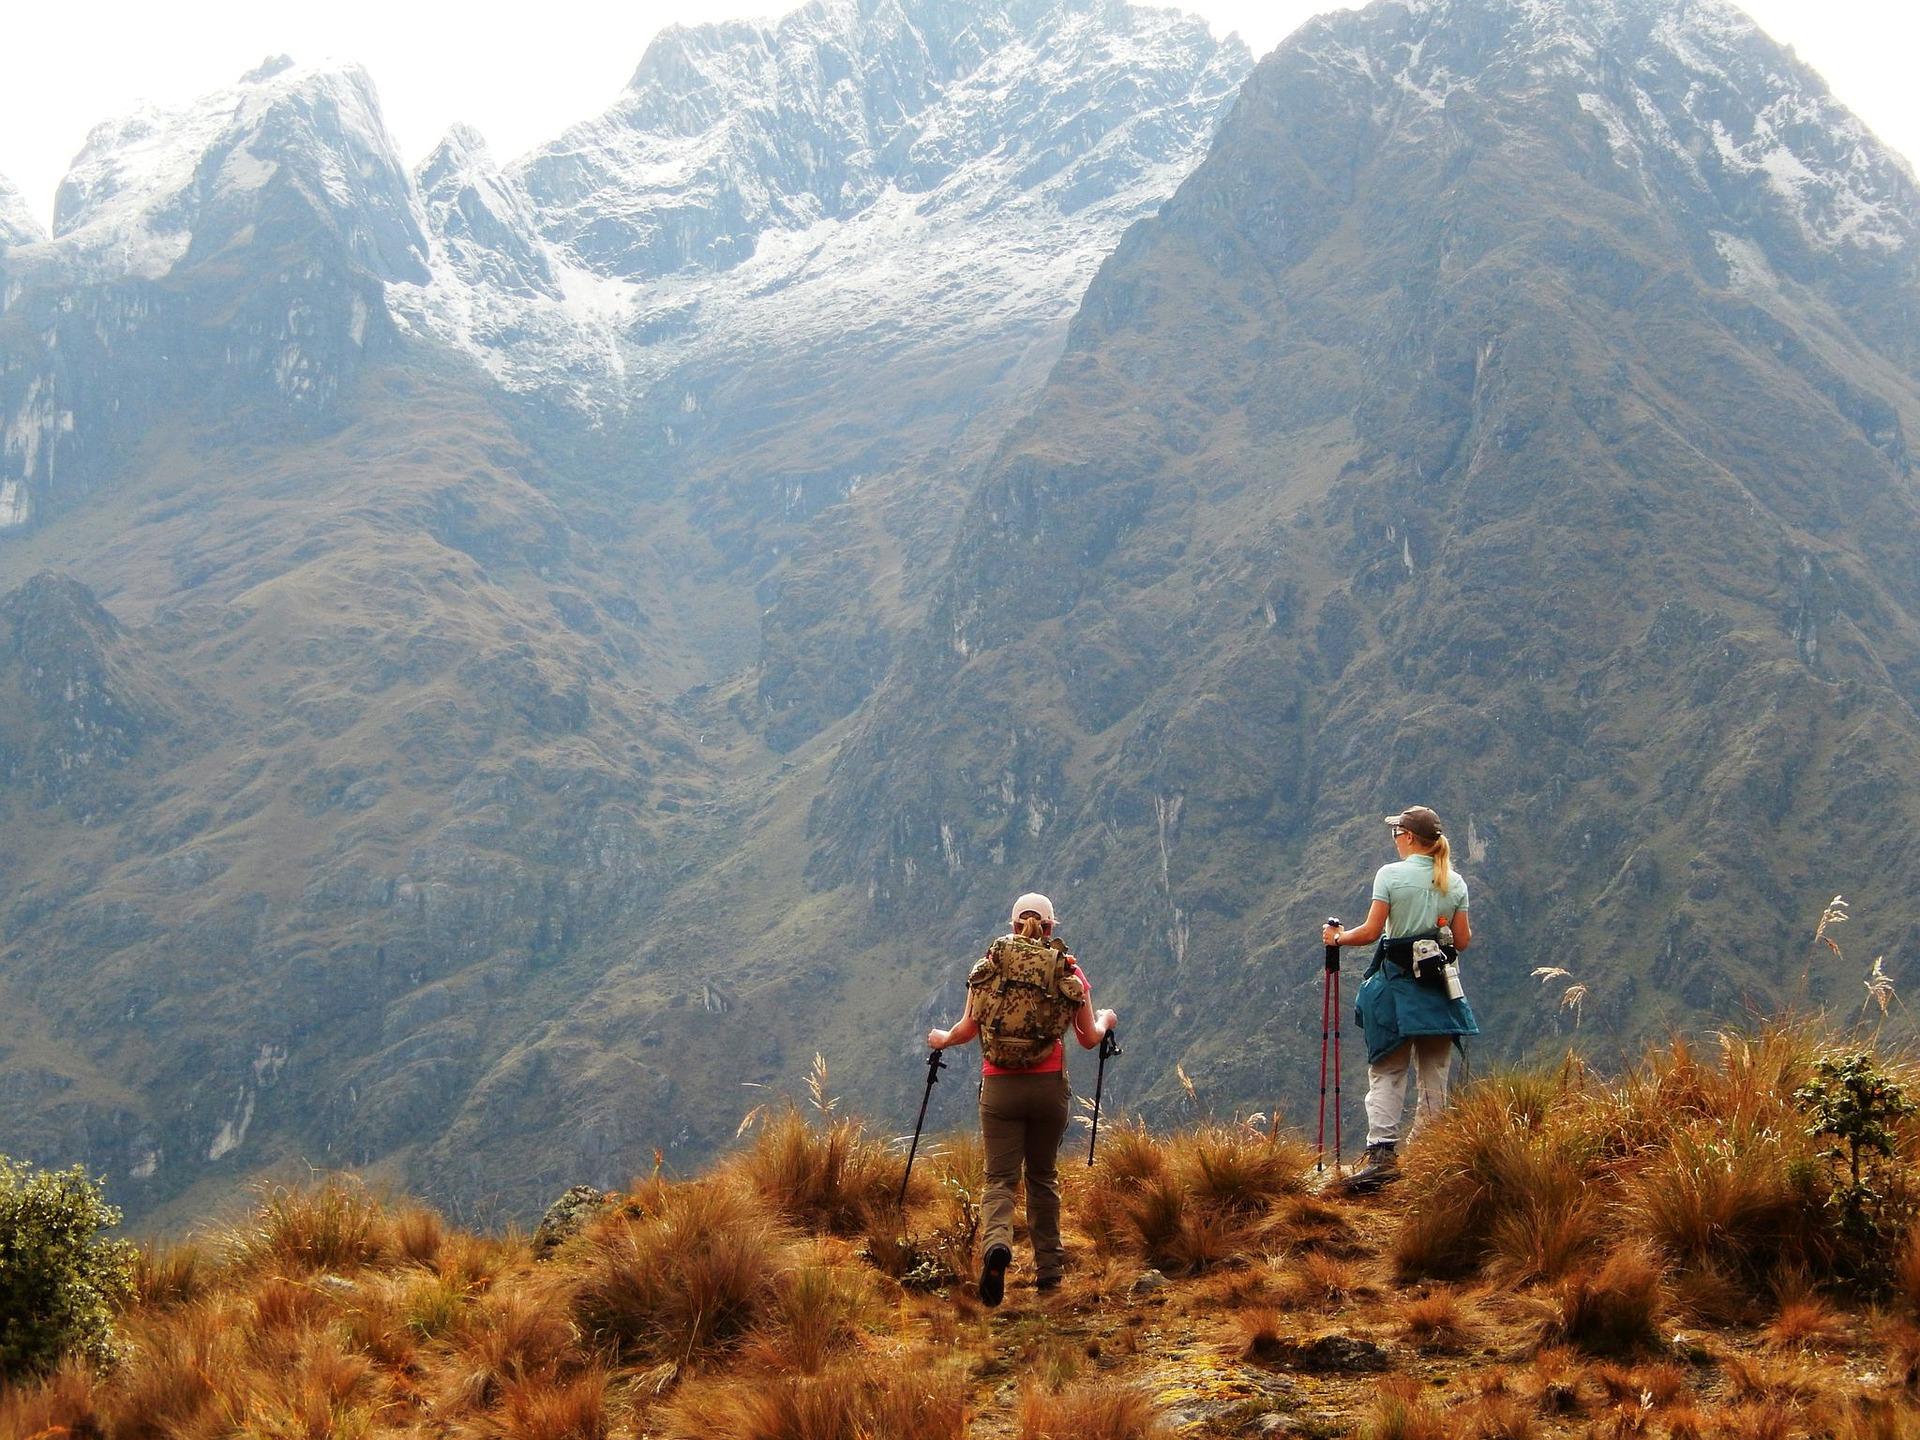 inca-trail-1563254_1920.jpg